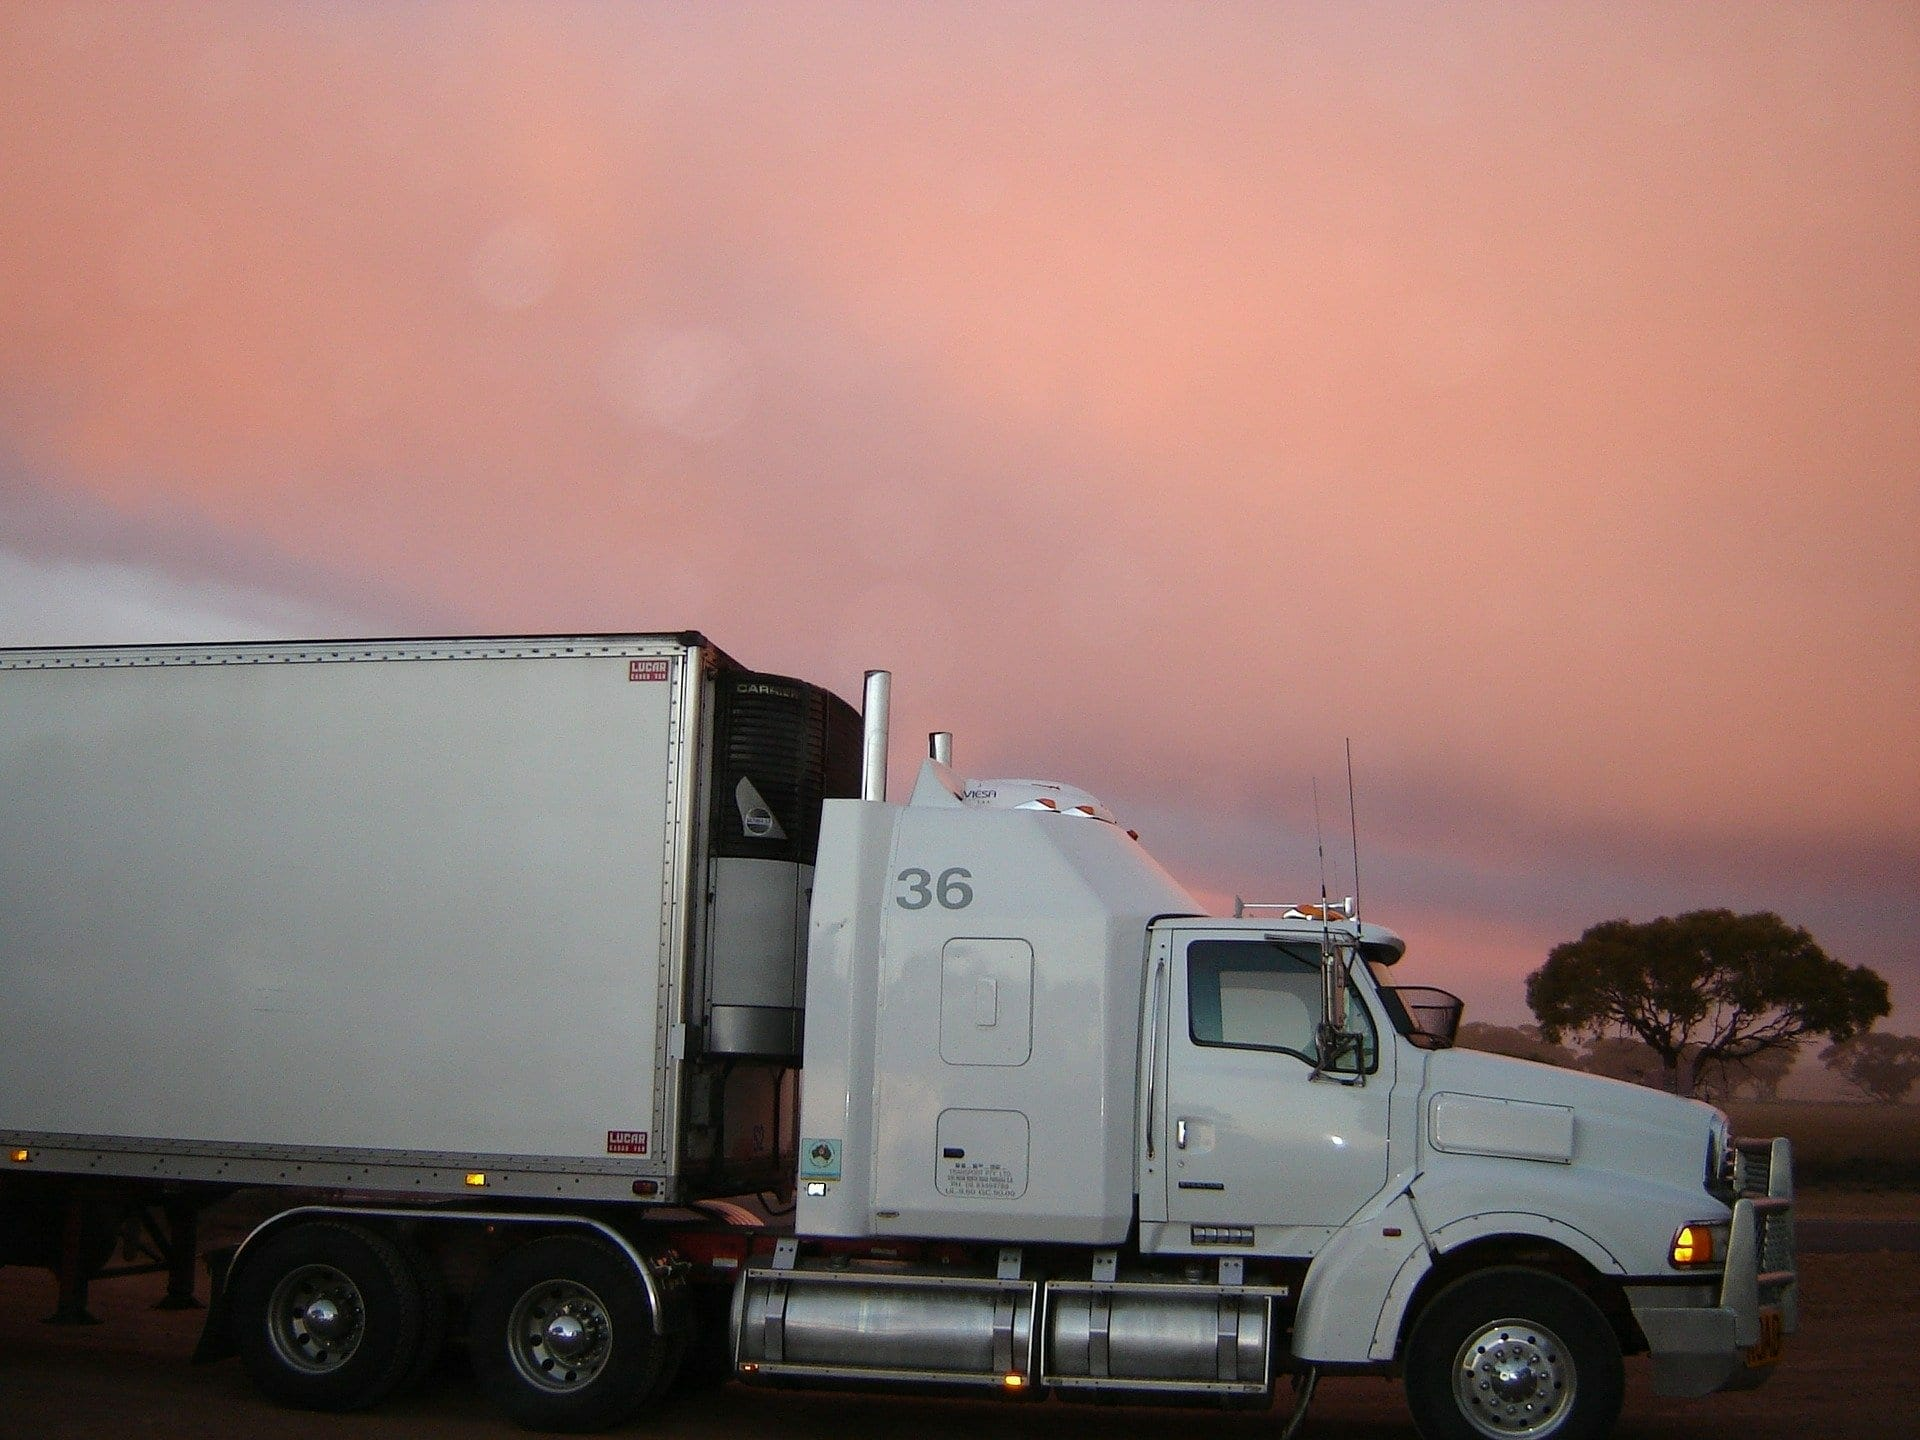 Truck Accident Statistics and Self Driving Trucks